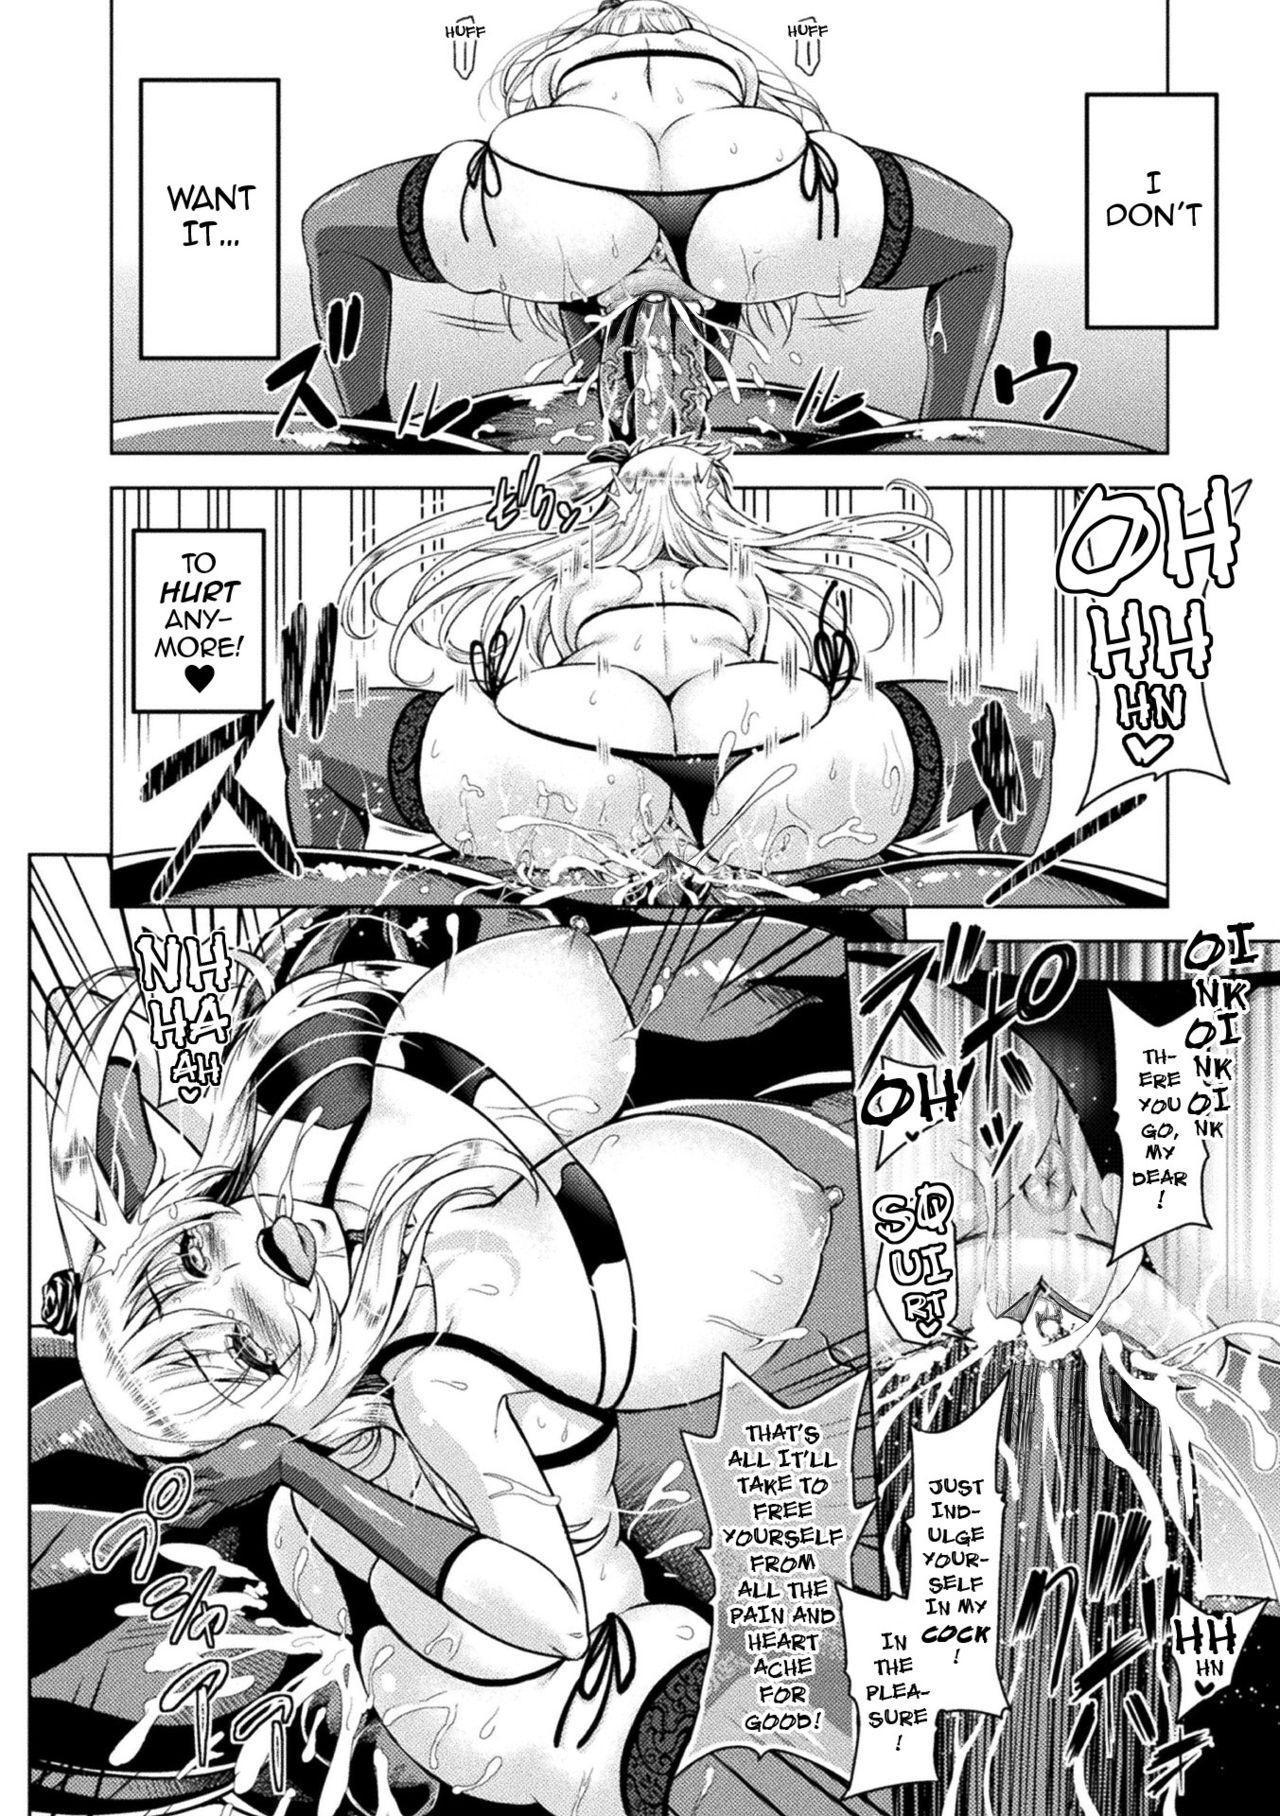 [Yamada Gogogo] Erona ~Orc no Inmon ni Okasareta Onna Kishi no Matsuro~ | Erona ~The Fall of a Beautiful Knight Cursed with the Lewd Mark of an Orc~ Ch. 1-6 [English] [darknight] [Decensored] [ongoing] 63